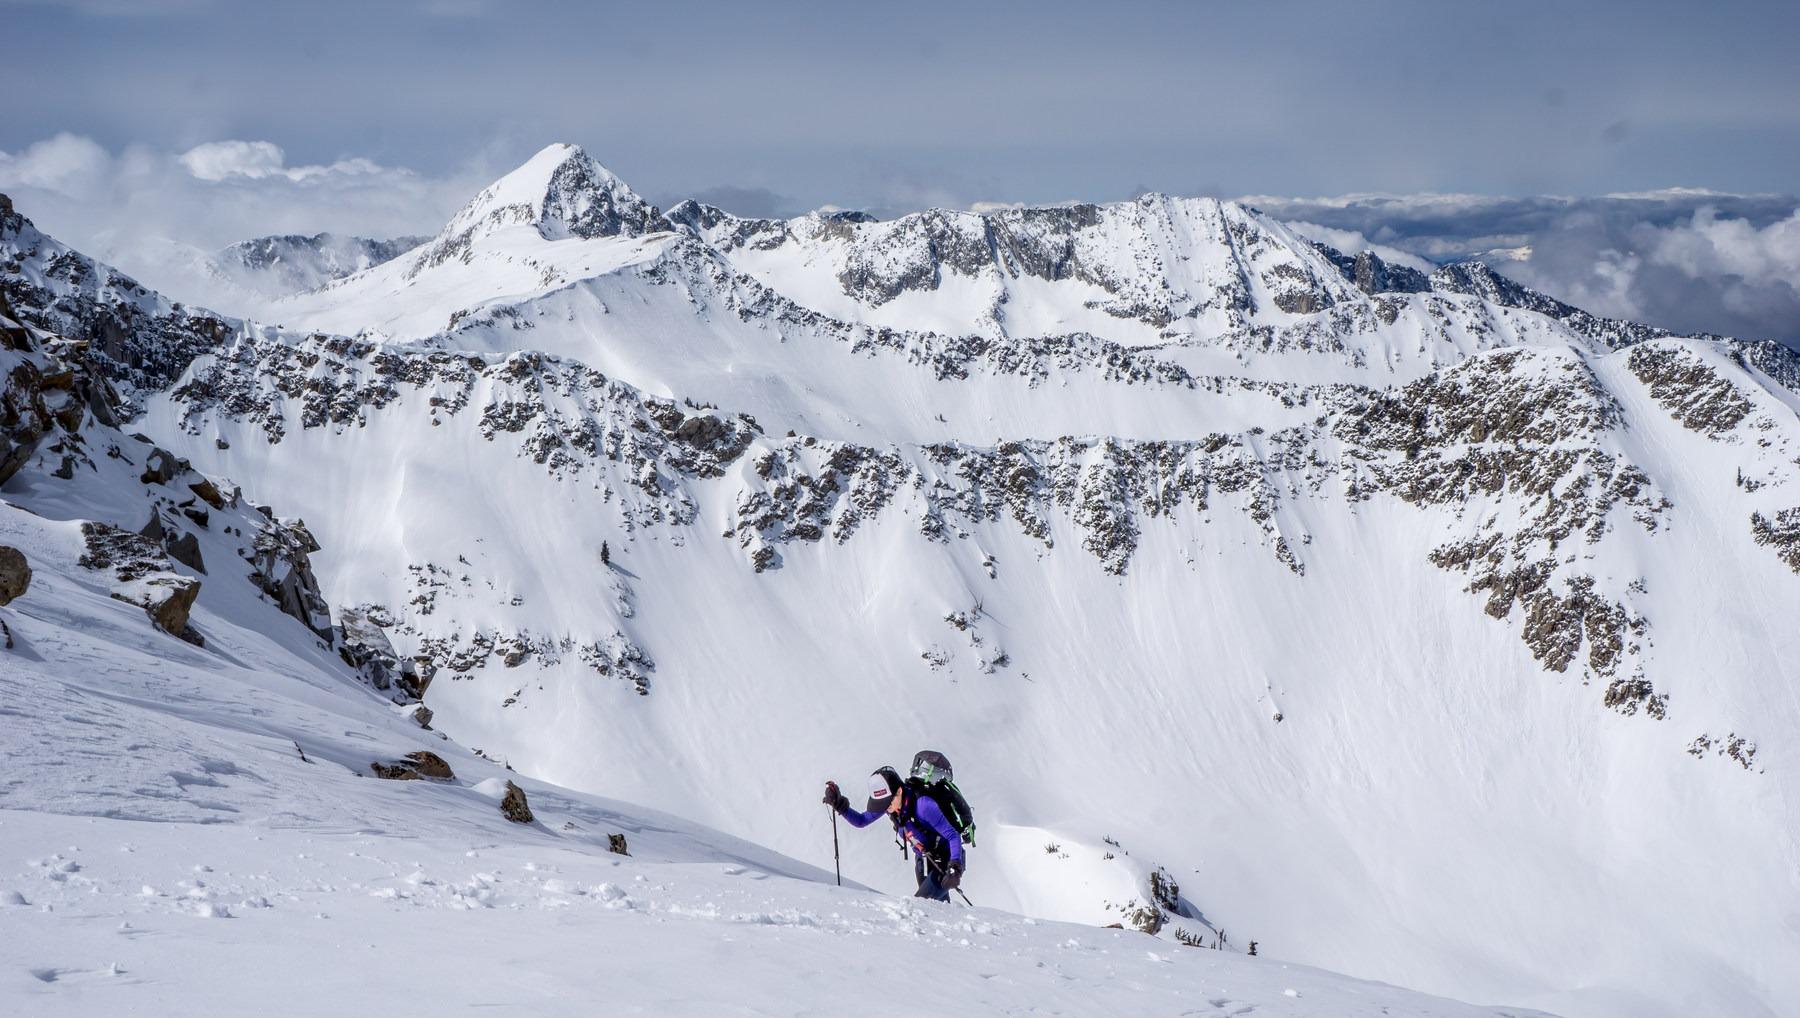 great backcountry skiing near salt lake city, utah - outdoor project